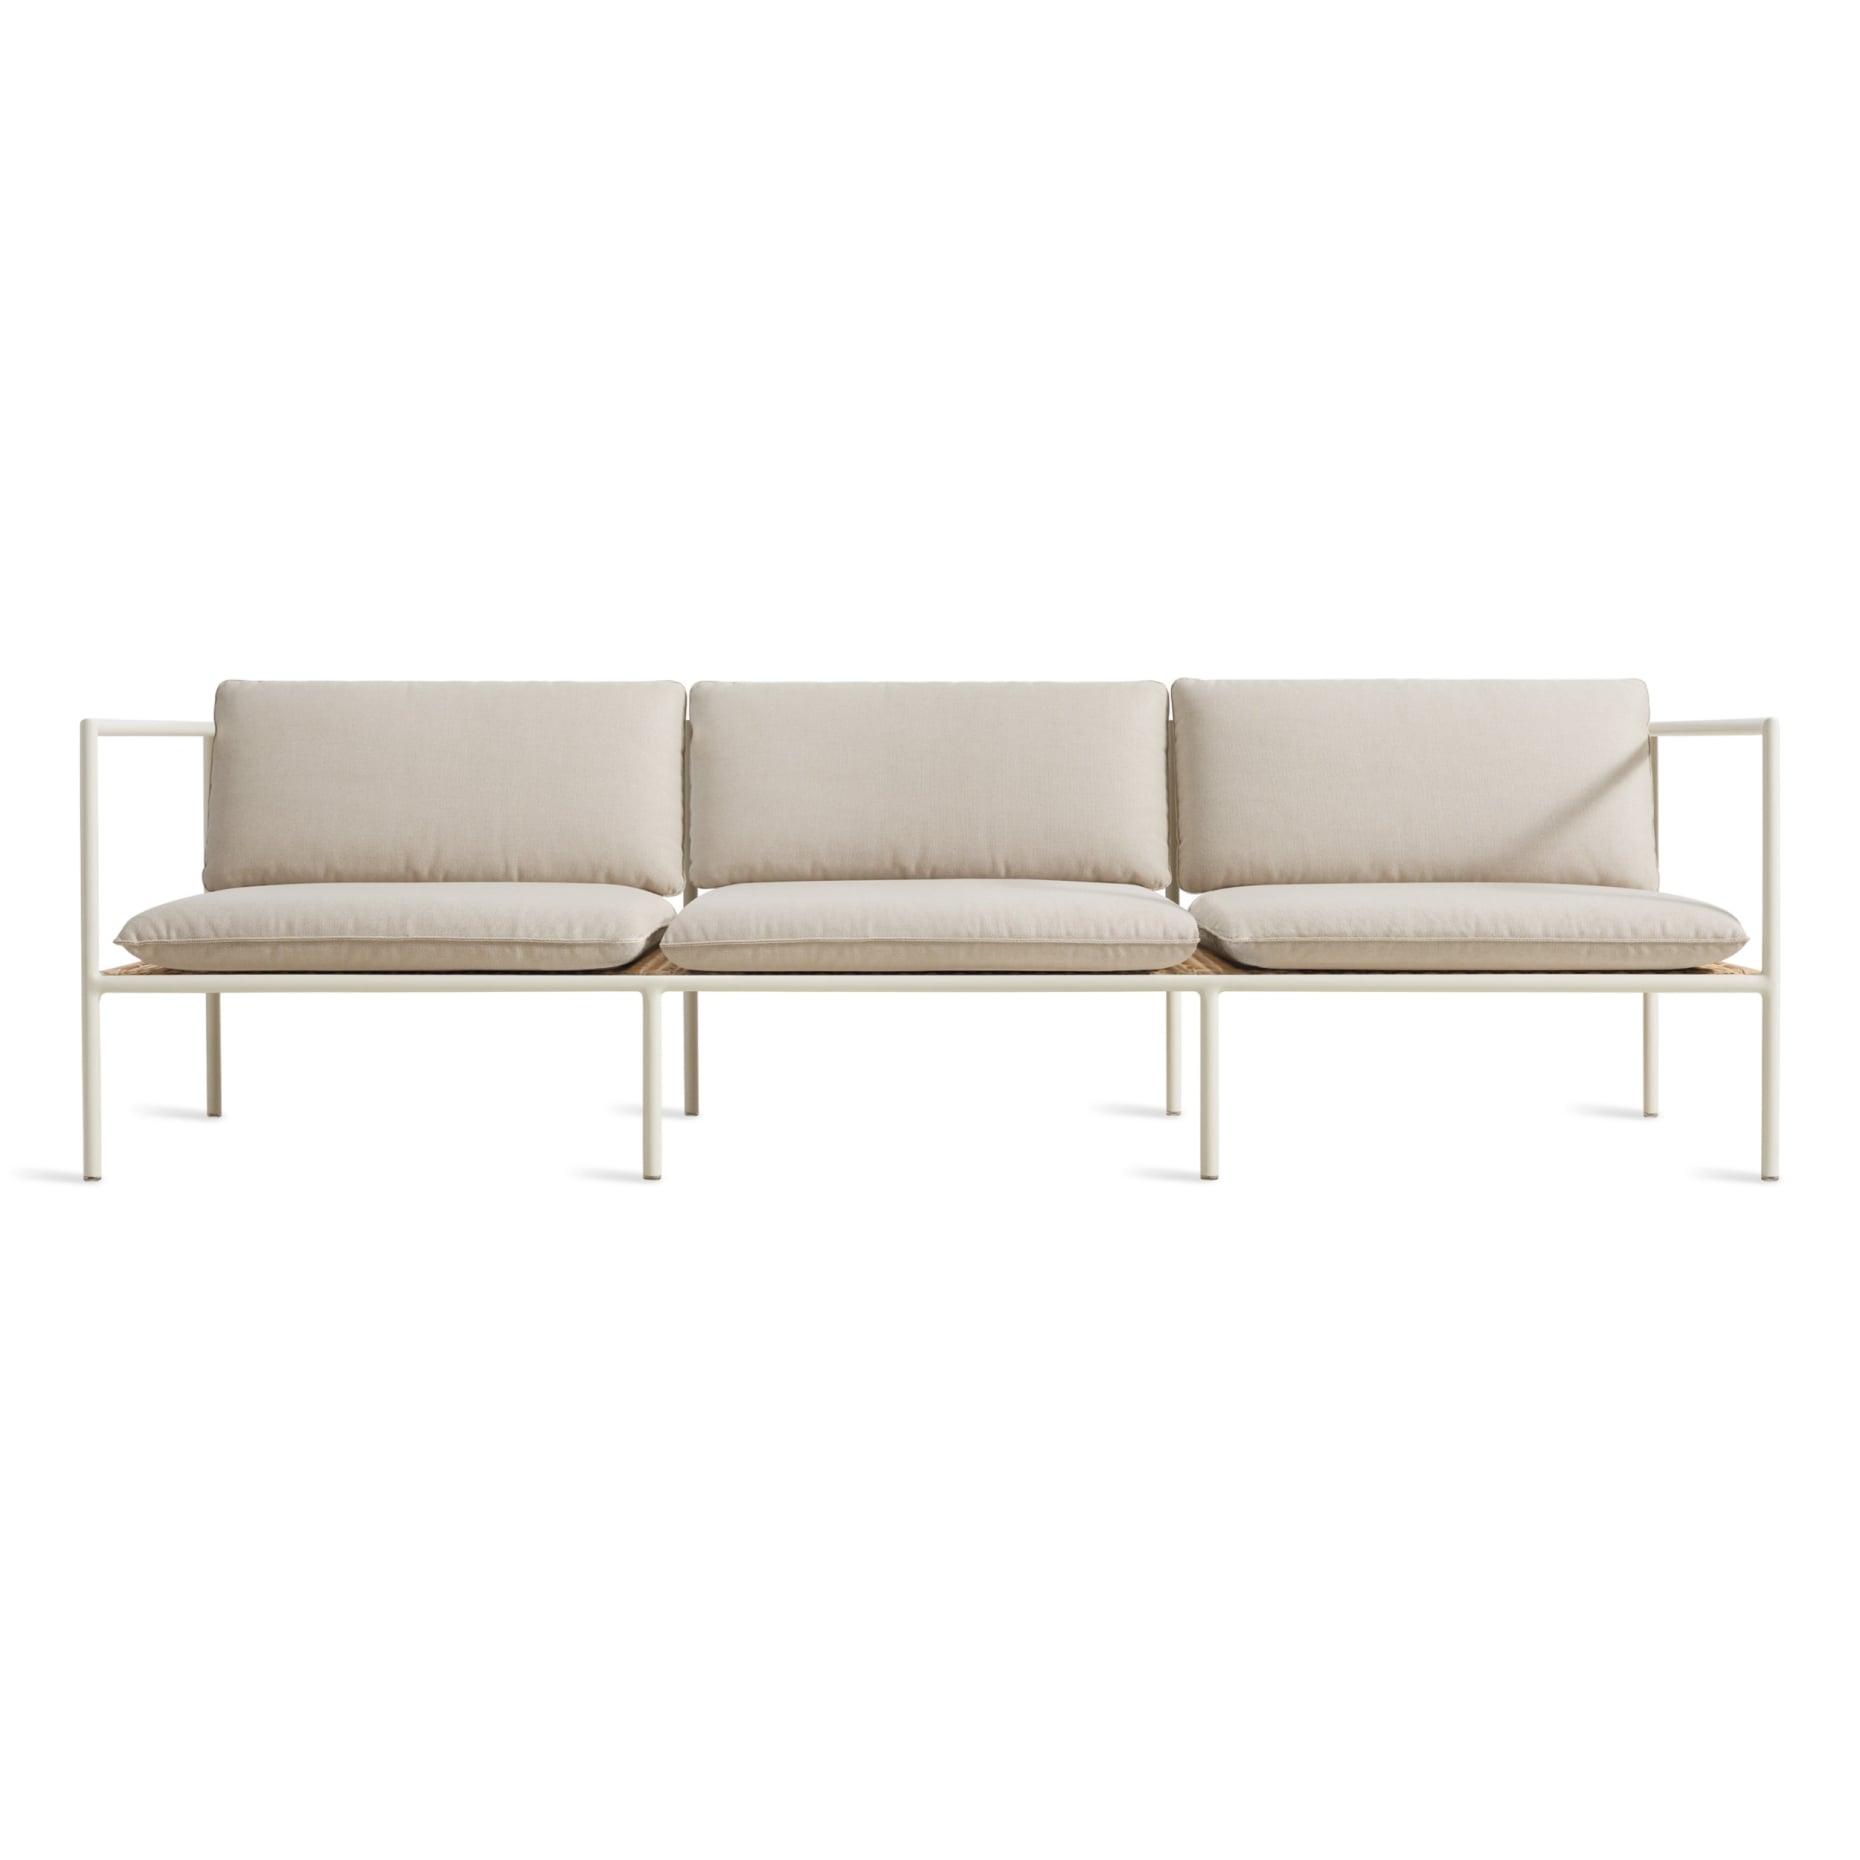 dg1 3stsfa ln frontlow dog days outdoor 3 seat sofa sunbrella linen white